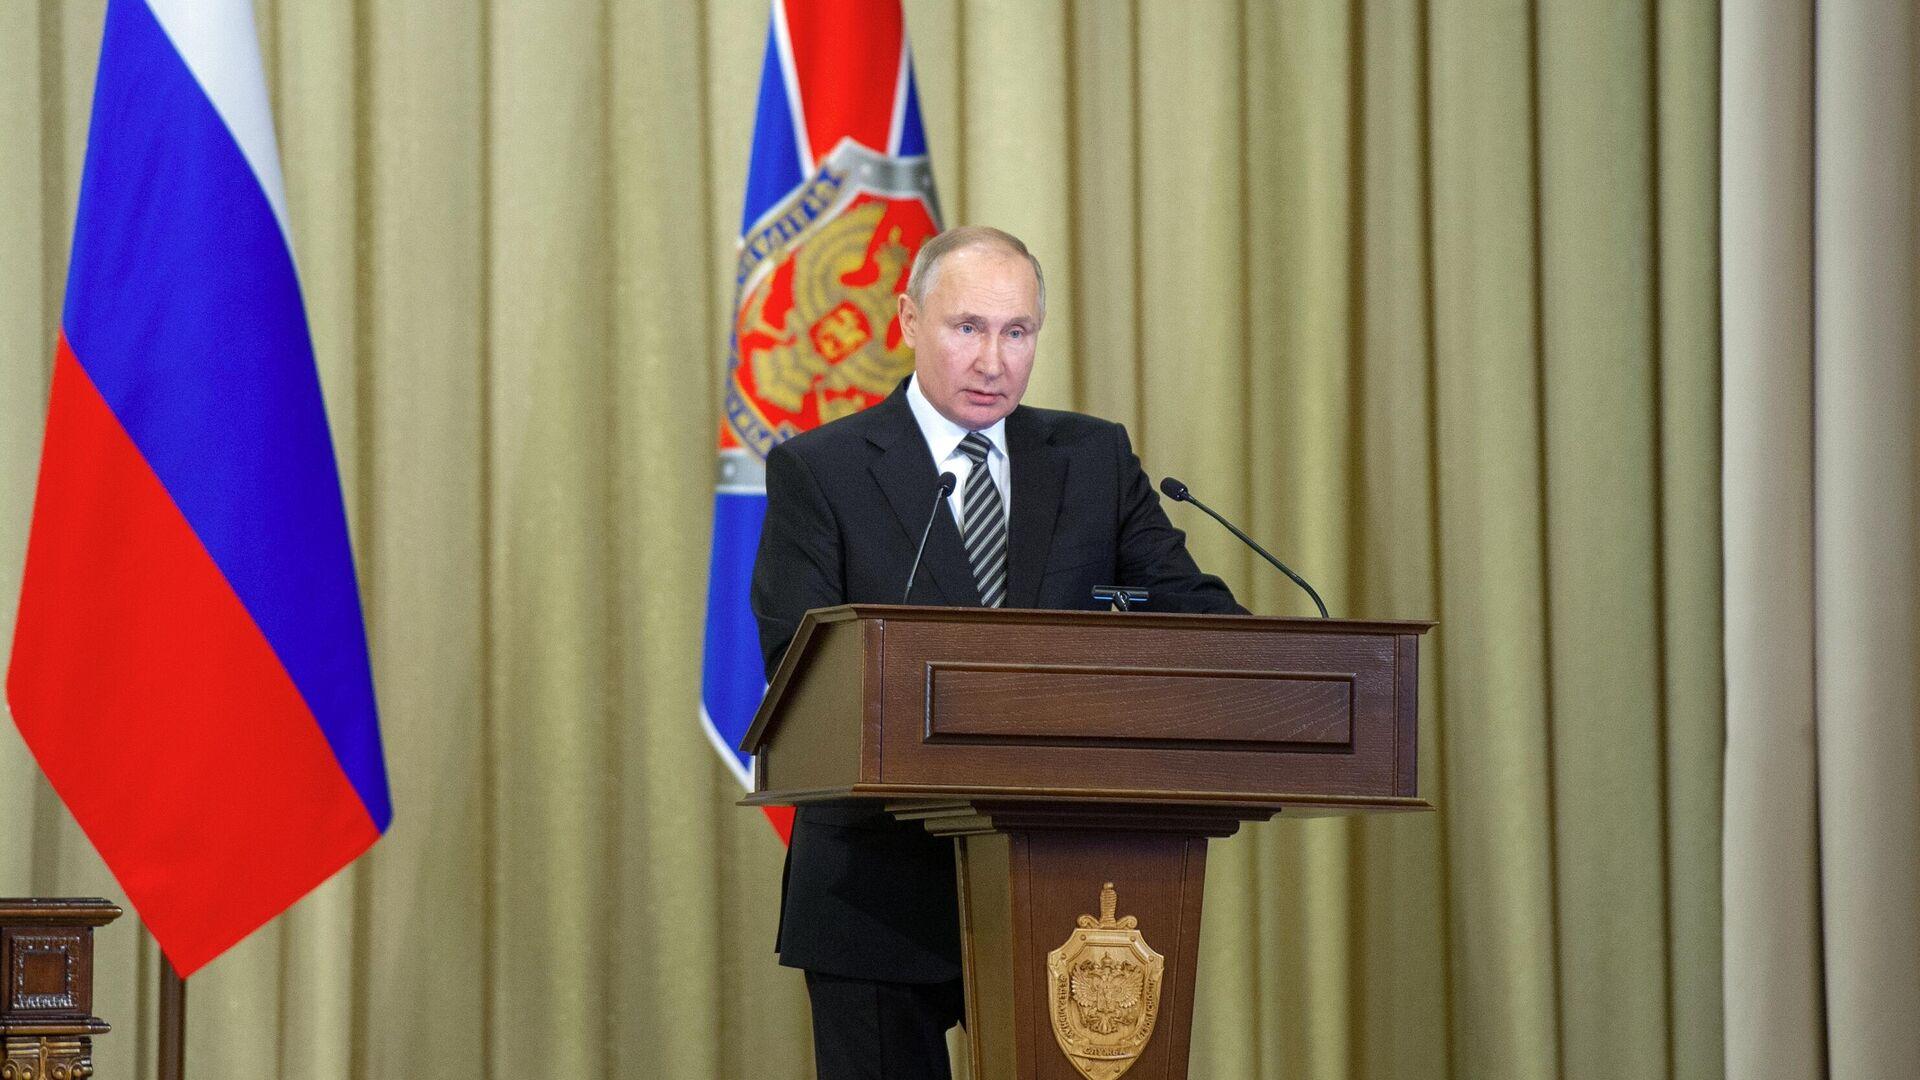 Vladímir Putin, presidente de Rusia - Sputnik Mundo, 1920, 24.02.2021